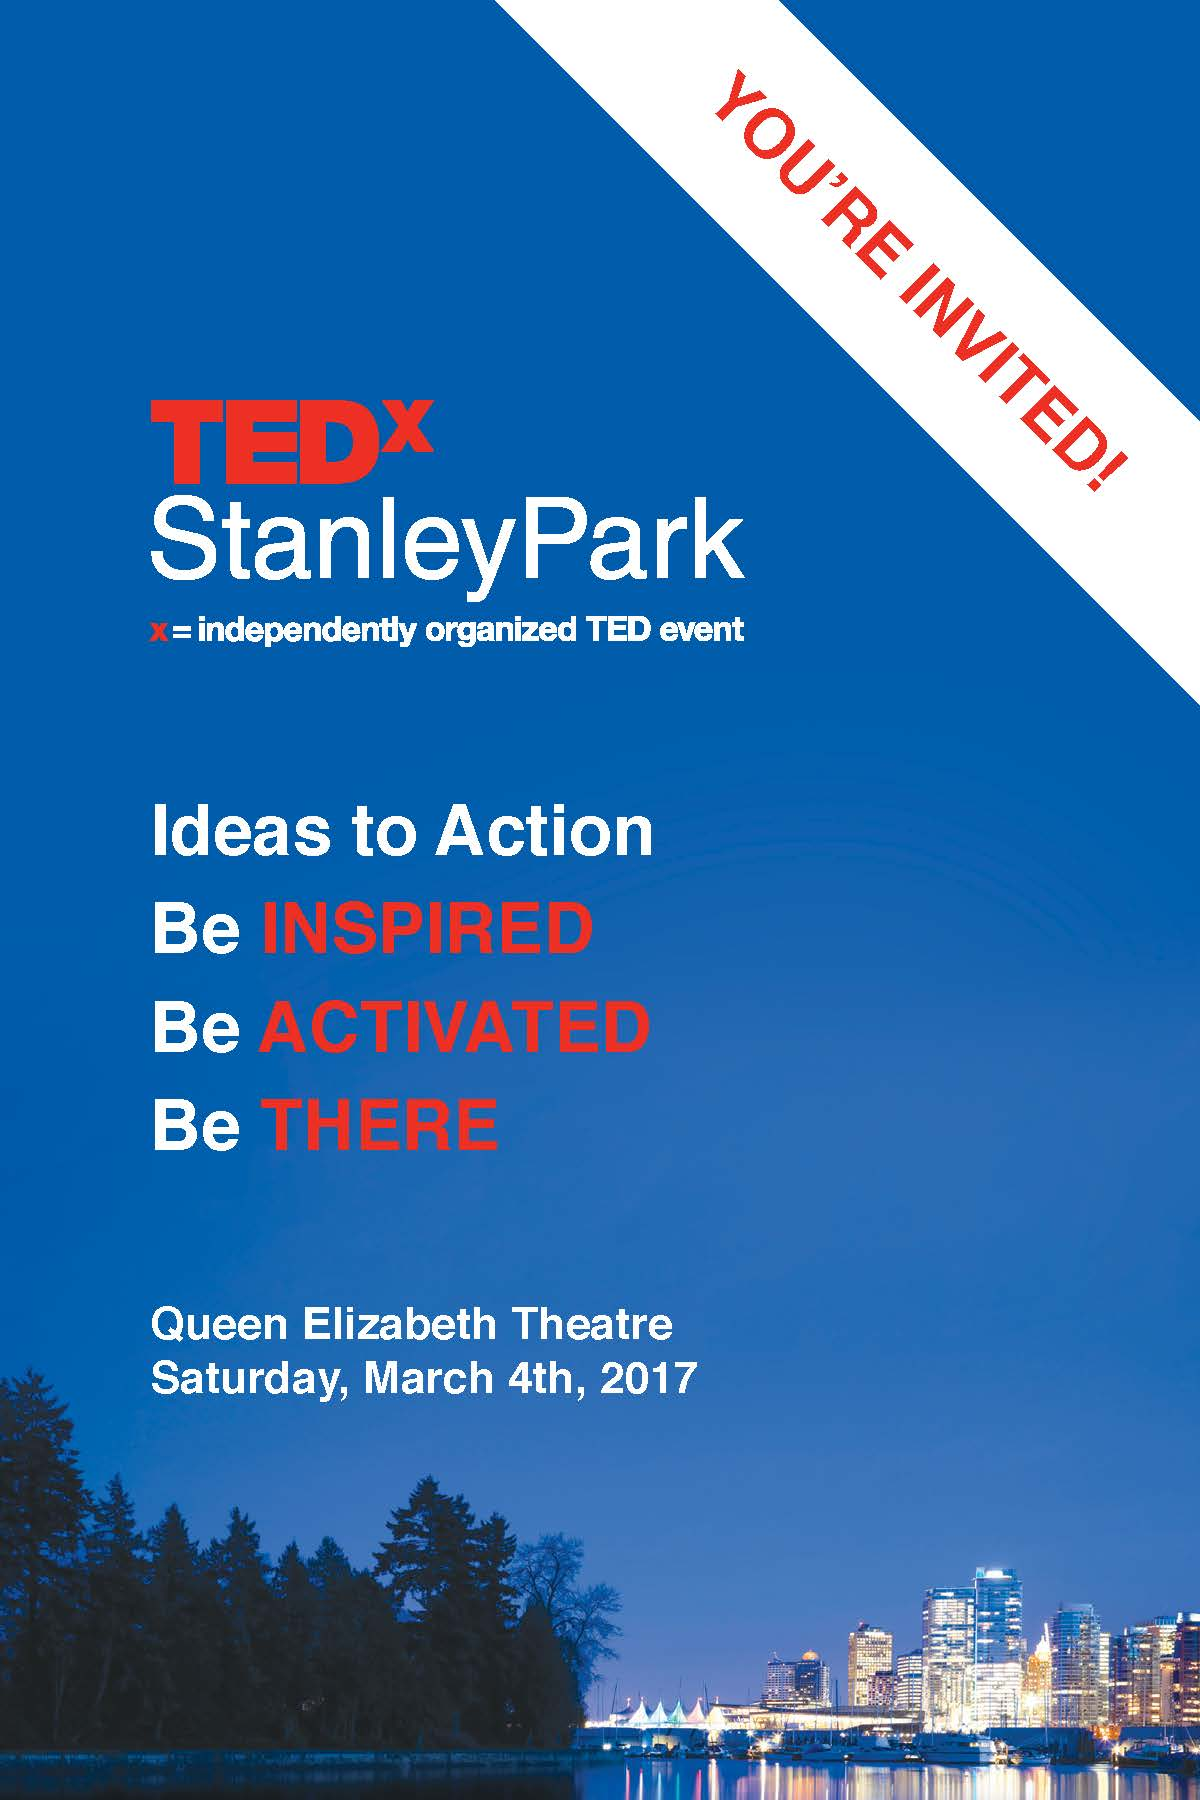 TEDxStanleyPark 2017 brochure